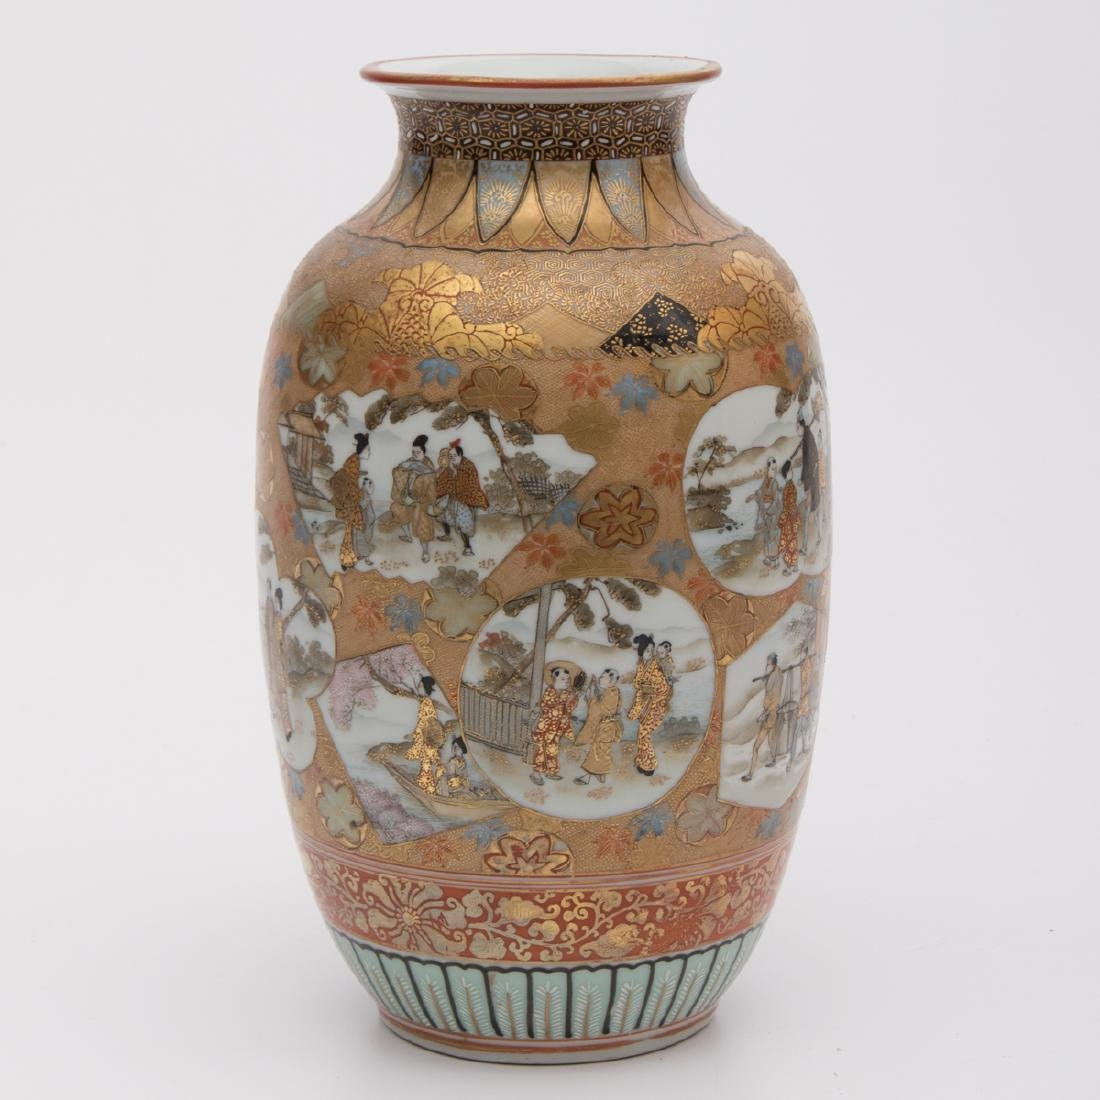 A Japanese Satsuma Porcelain Vase, 19th/20th Century.